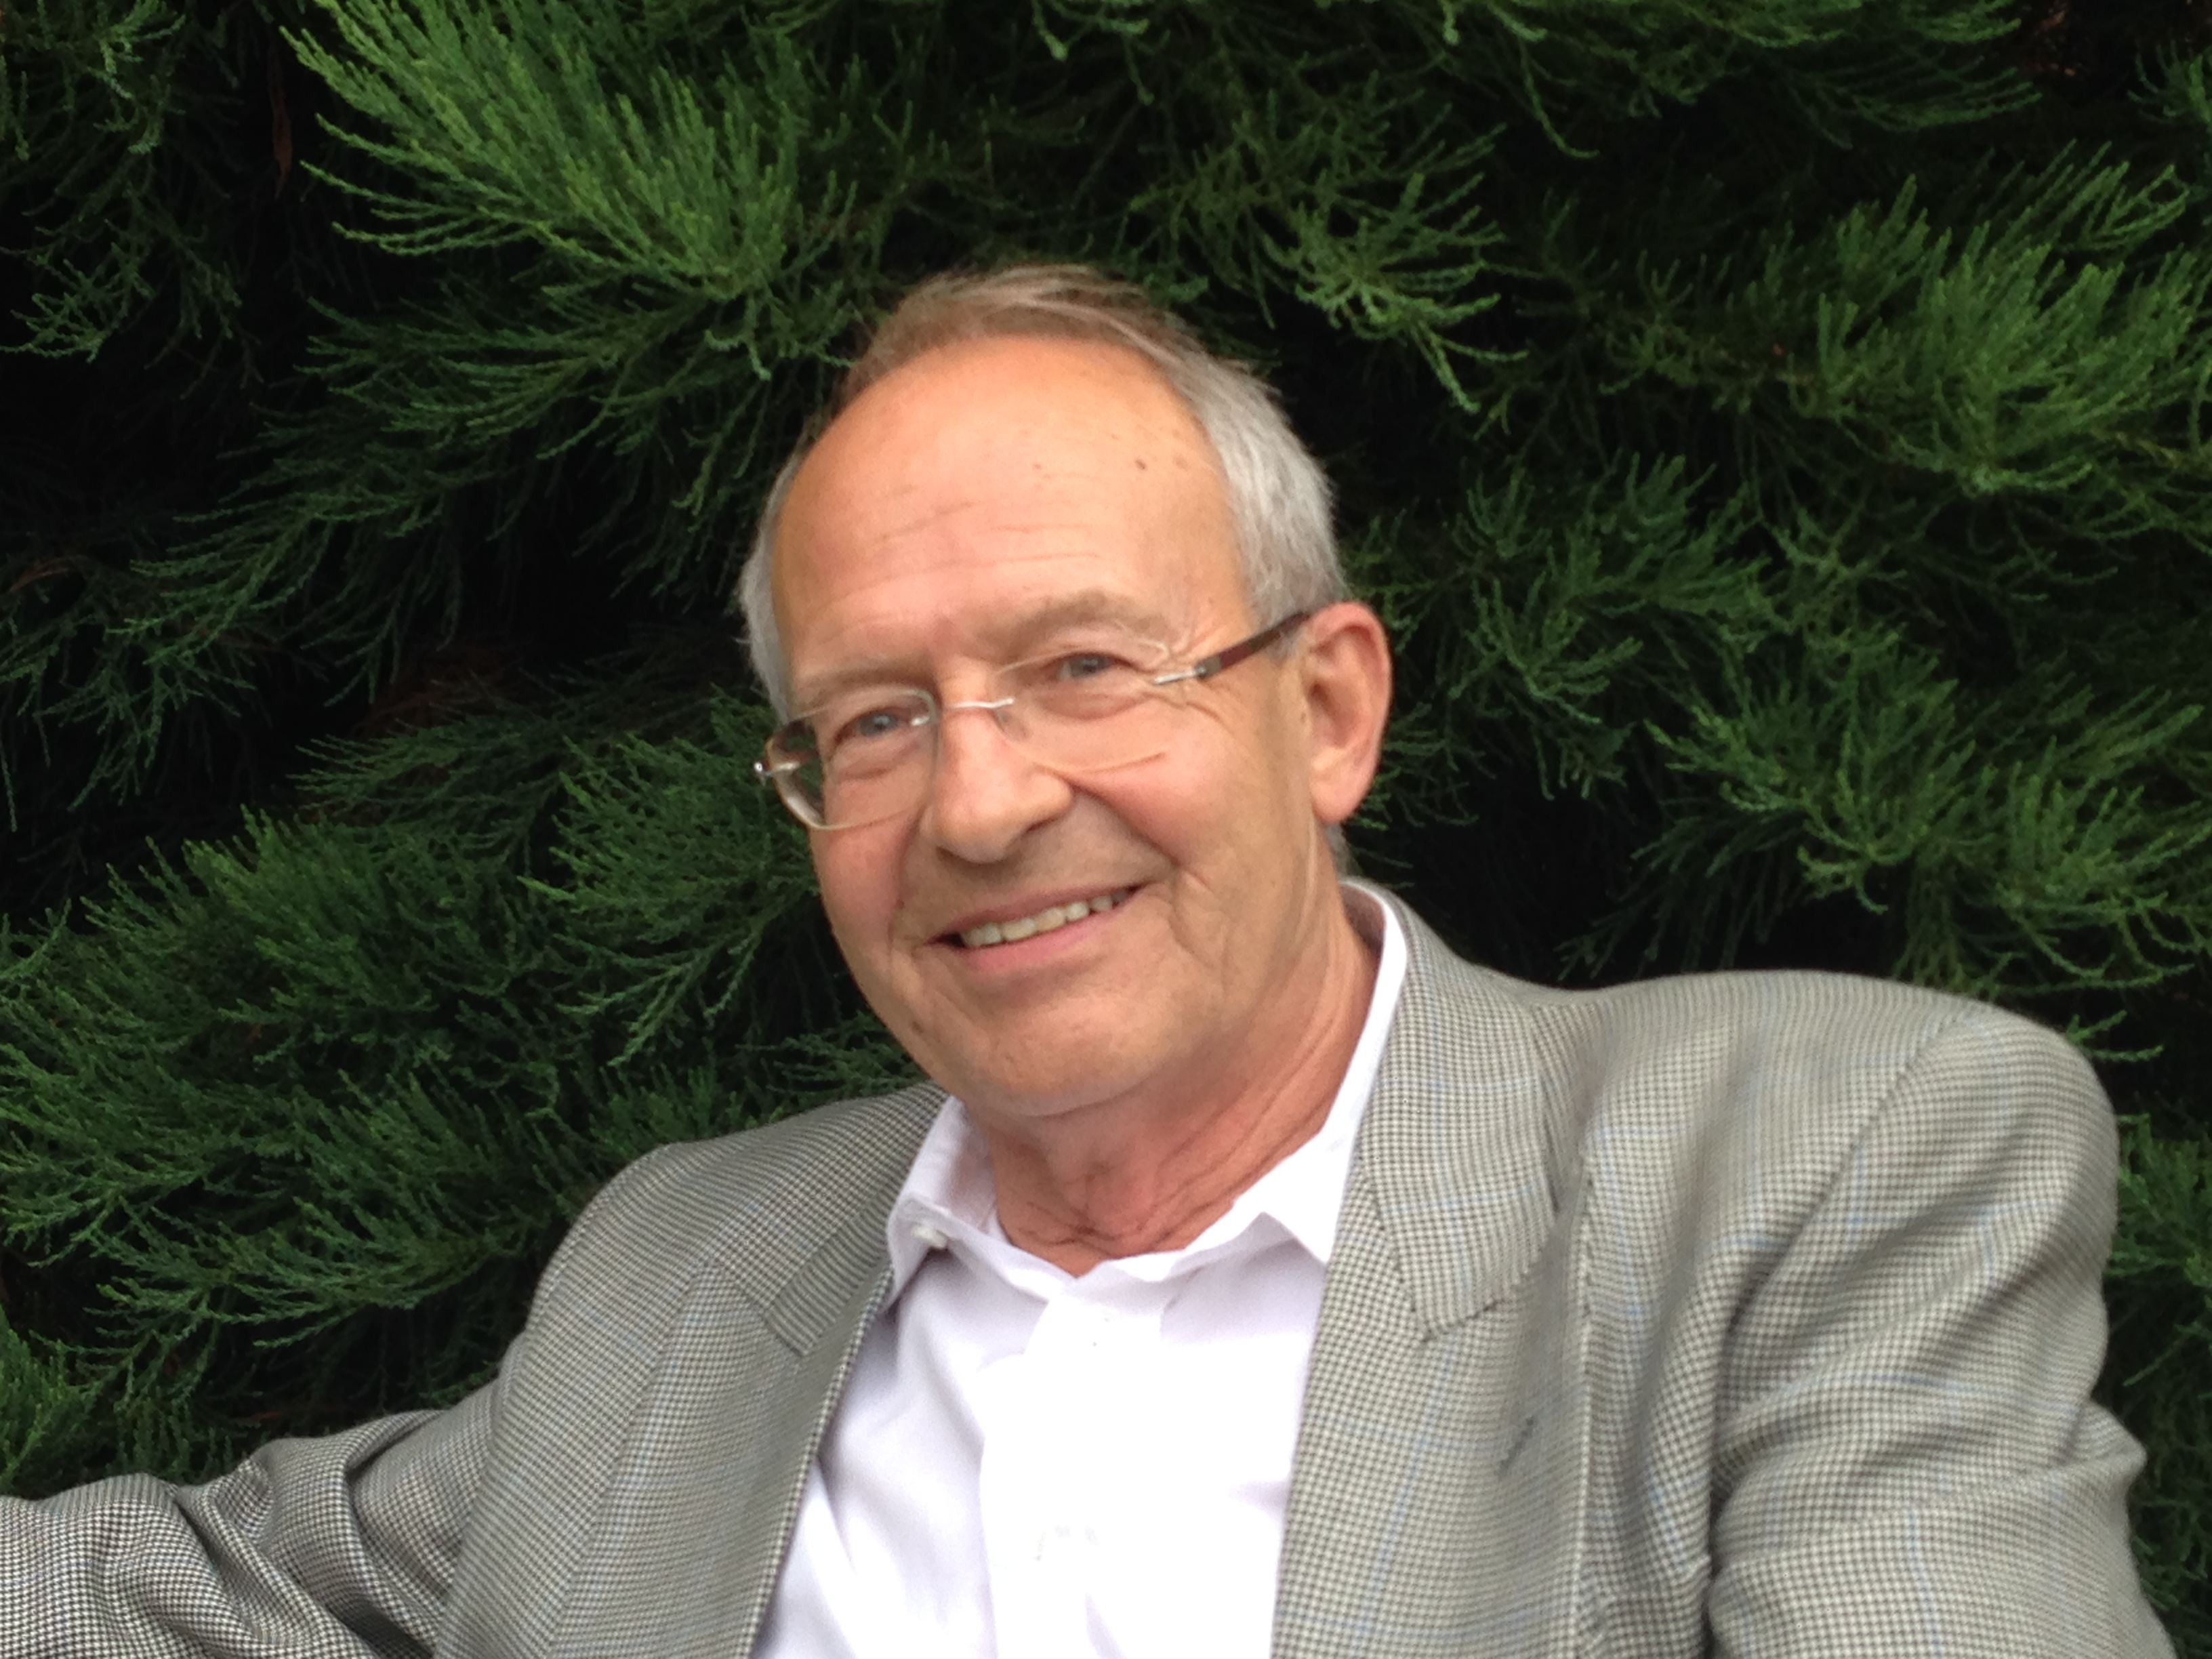 Jörg Rickenmann